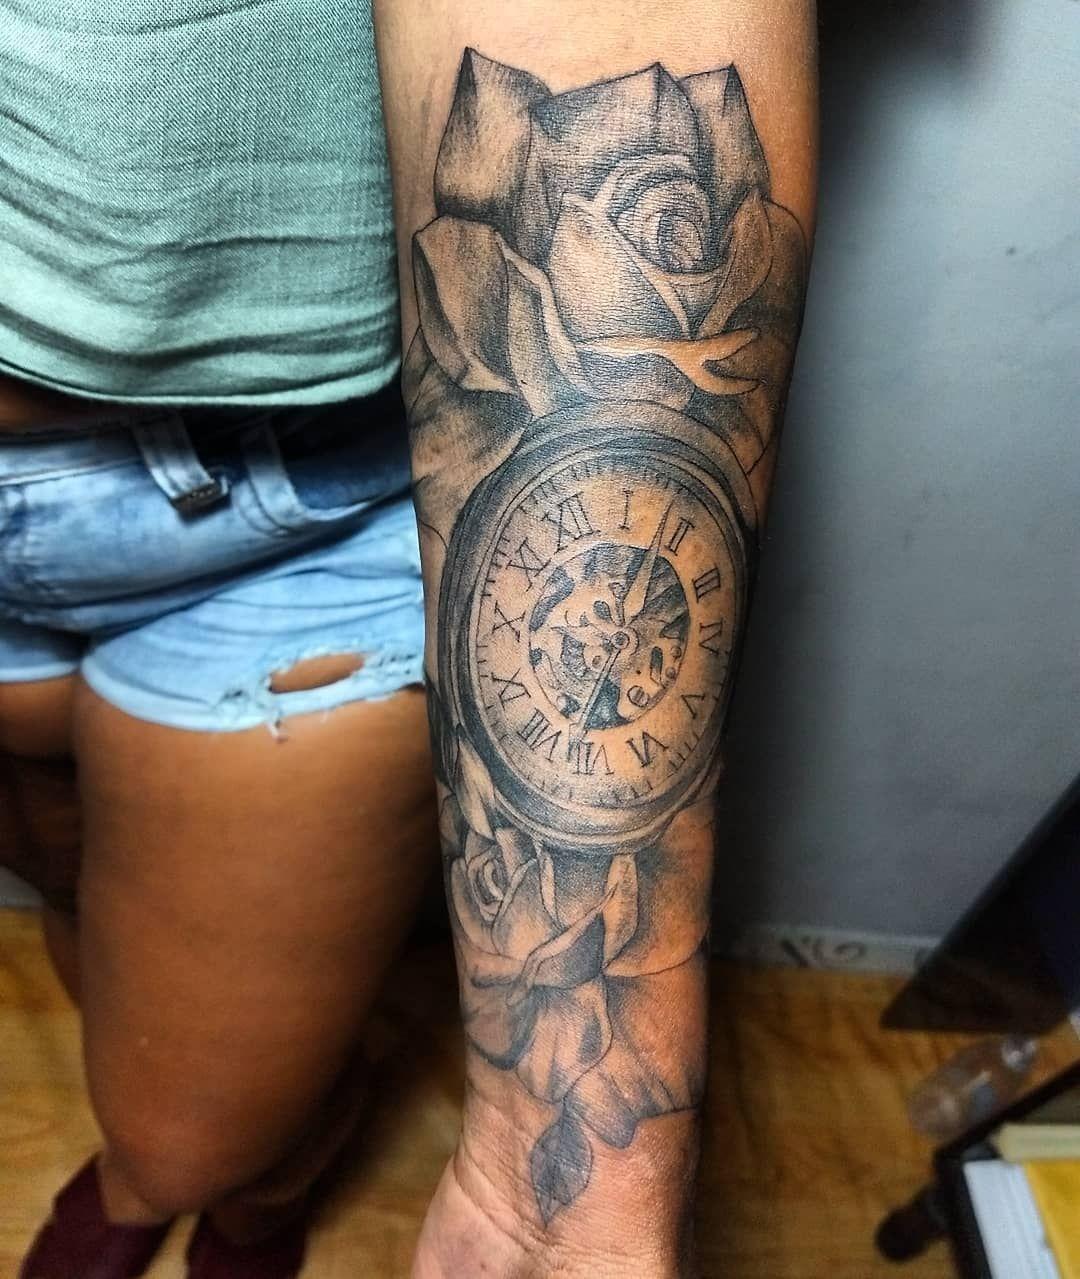 Rosas🌹🌹 Relógio🕔🕔.. @danielle.patricia.904  #tattoofeminina #rosas #relogios #rosastattoo #realismo #realismotattoo #drawingtattoo #drawing #tattoo #tattoostudio #inktattoo #recife #brasil